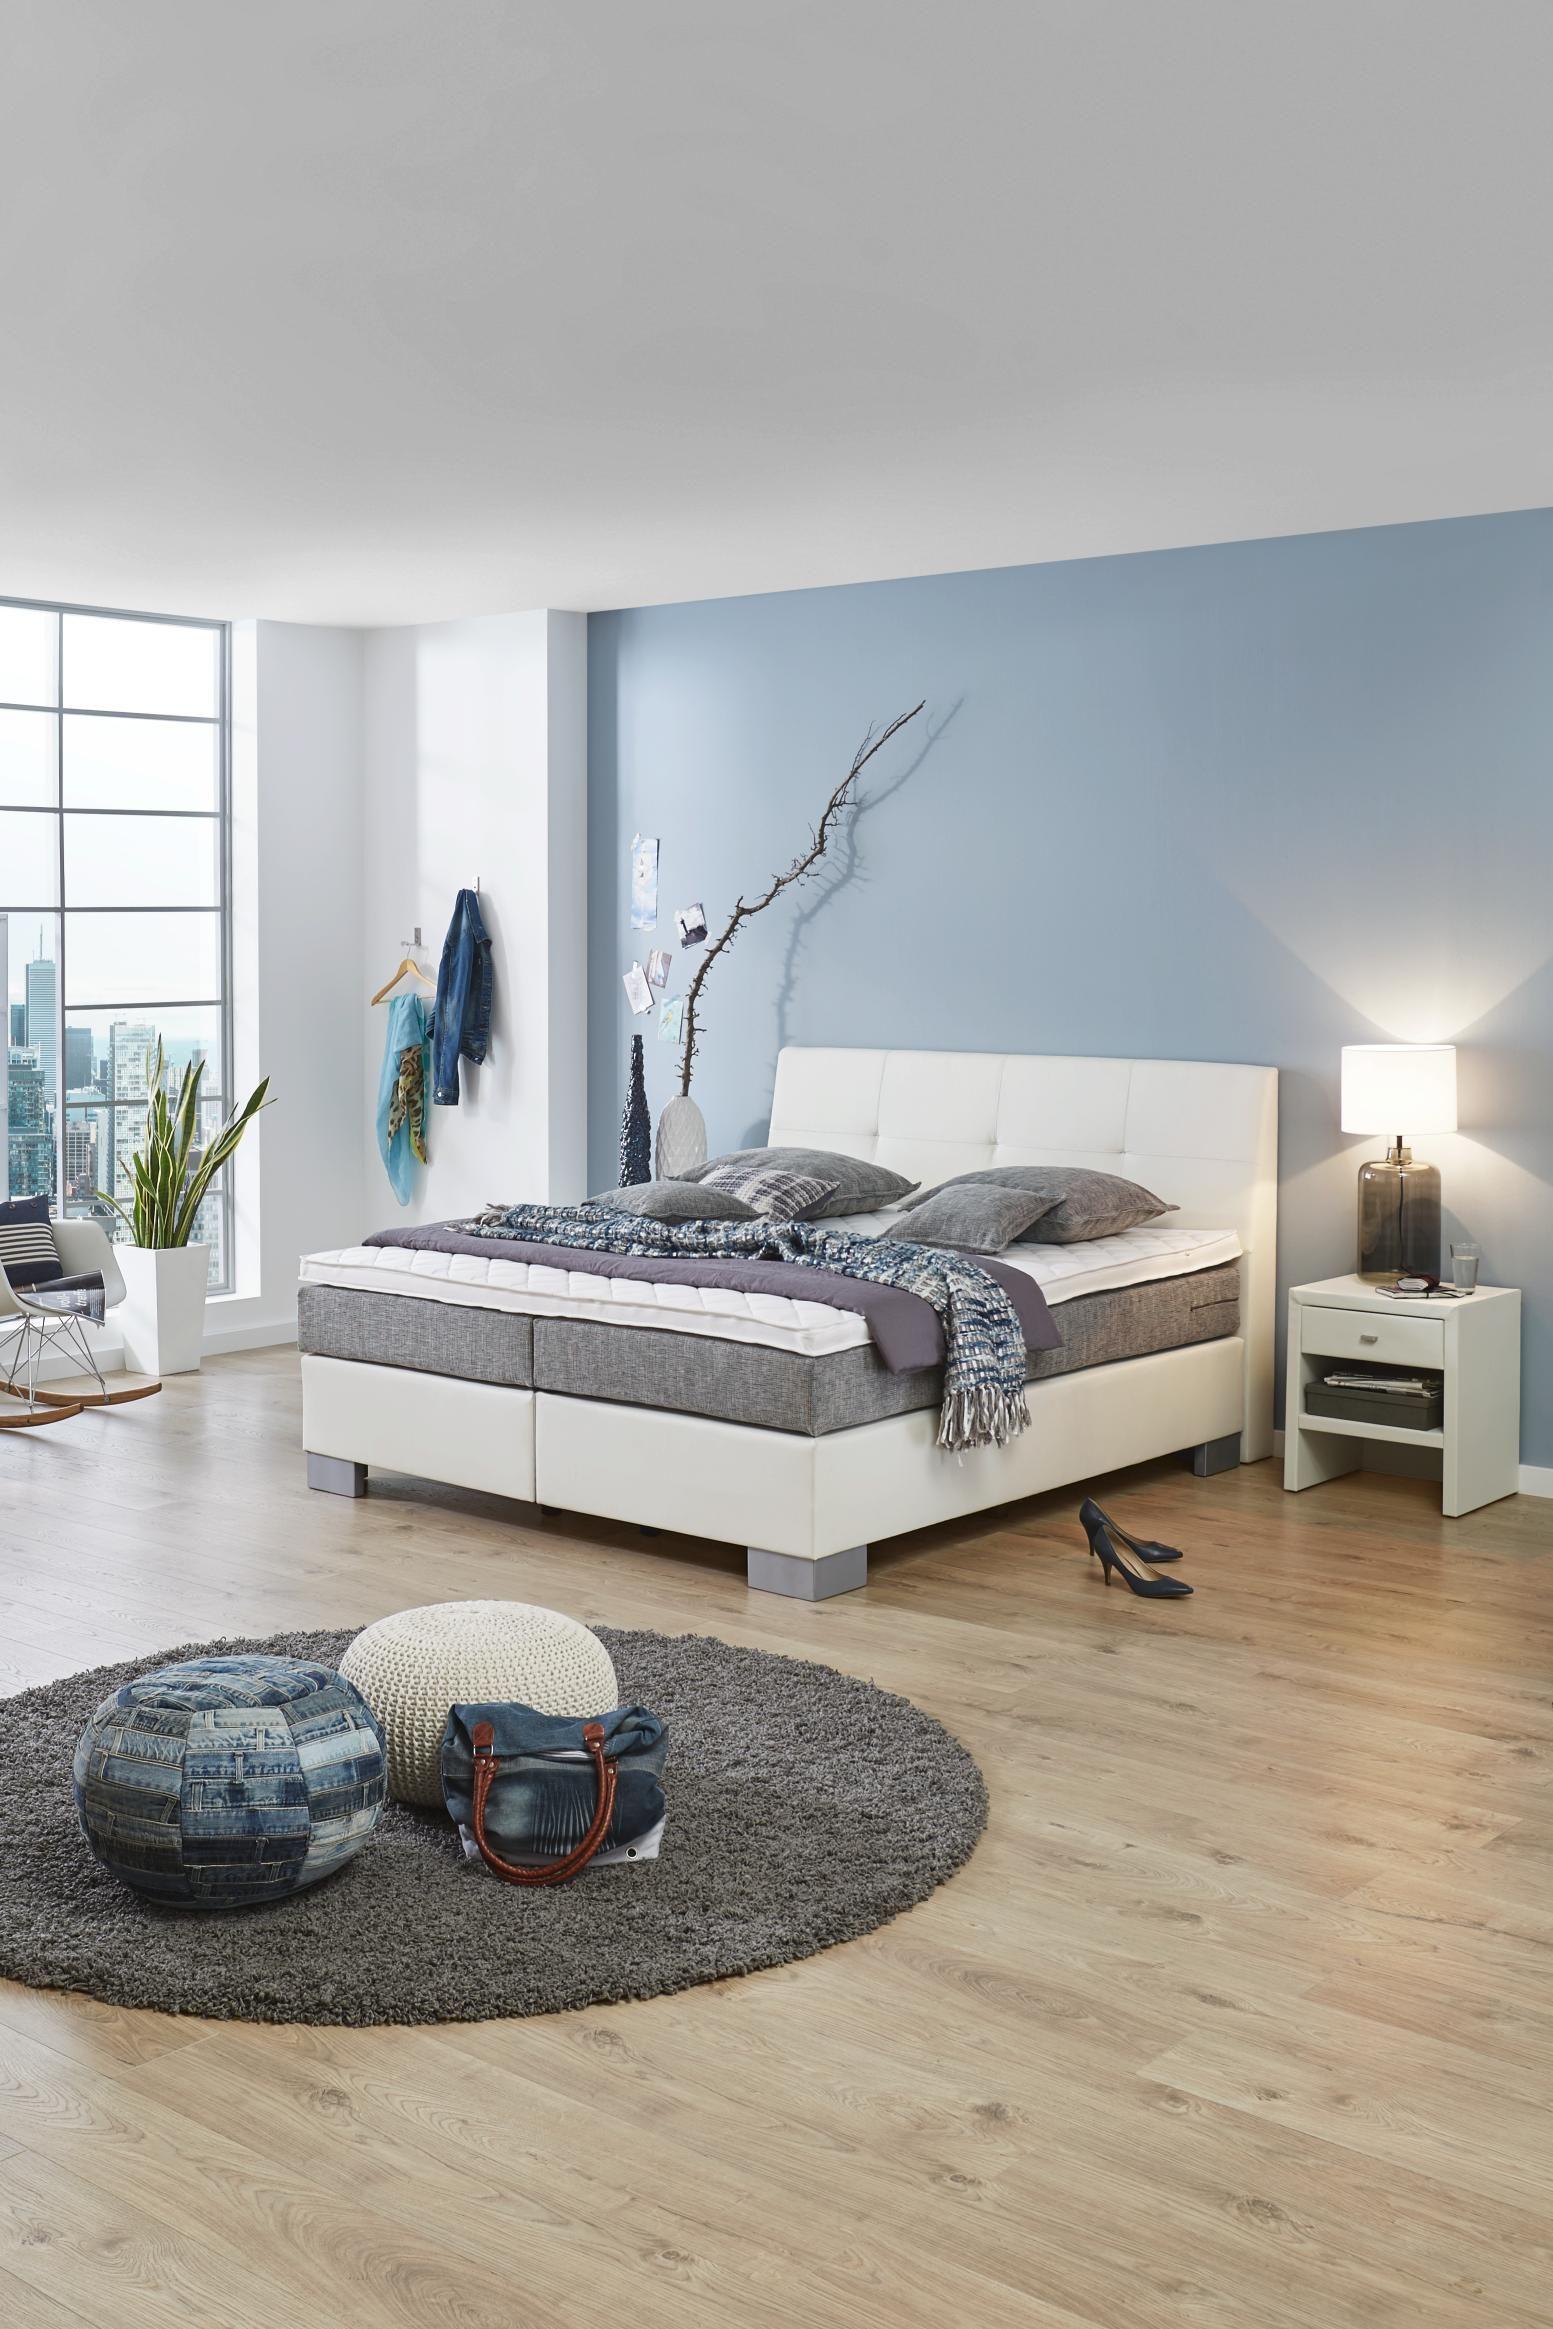 Doppelstockbett Weiß   Xxl Lutz Betten